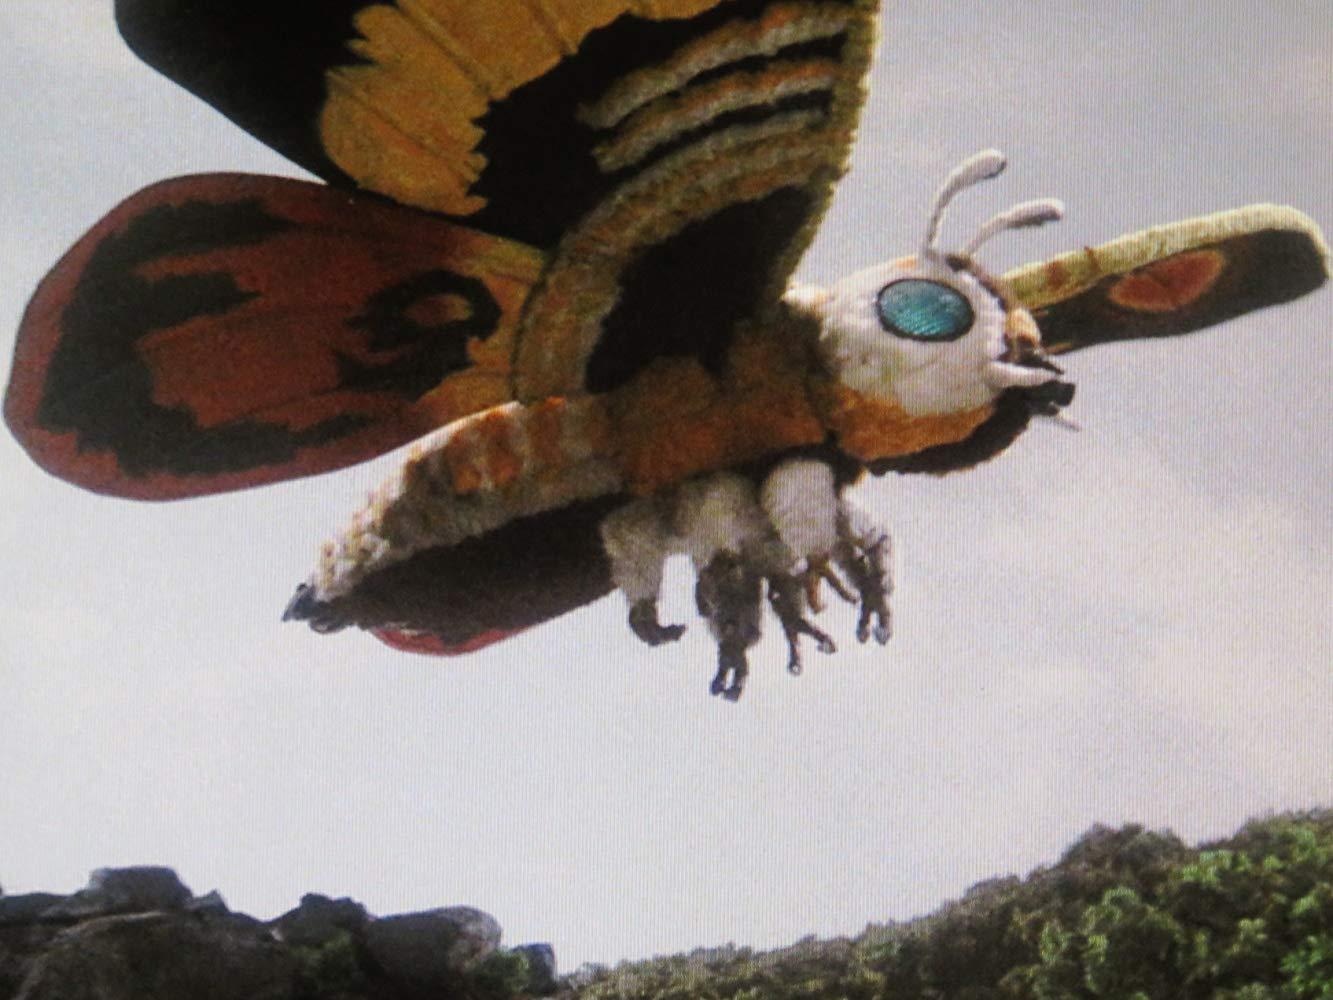 Rebirth of Mothra (1996) - Moria